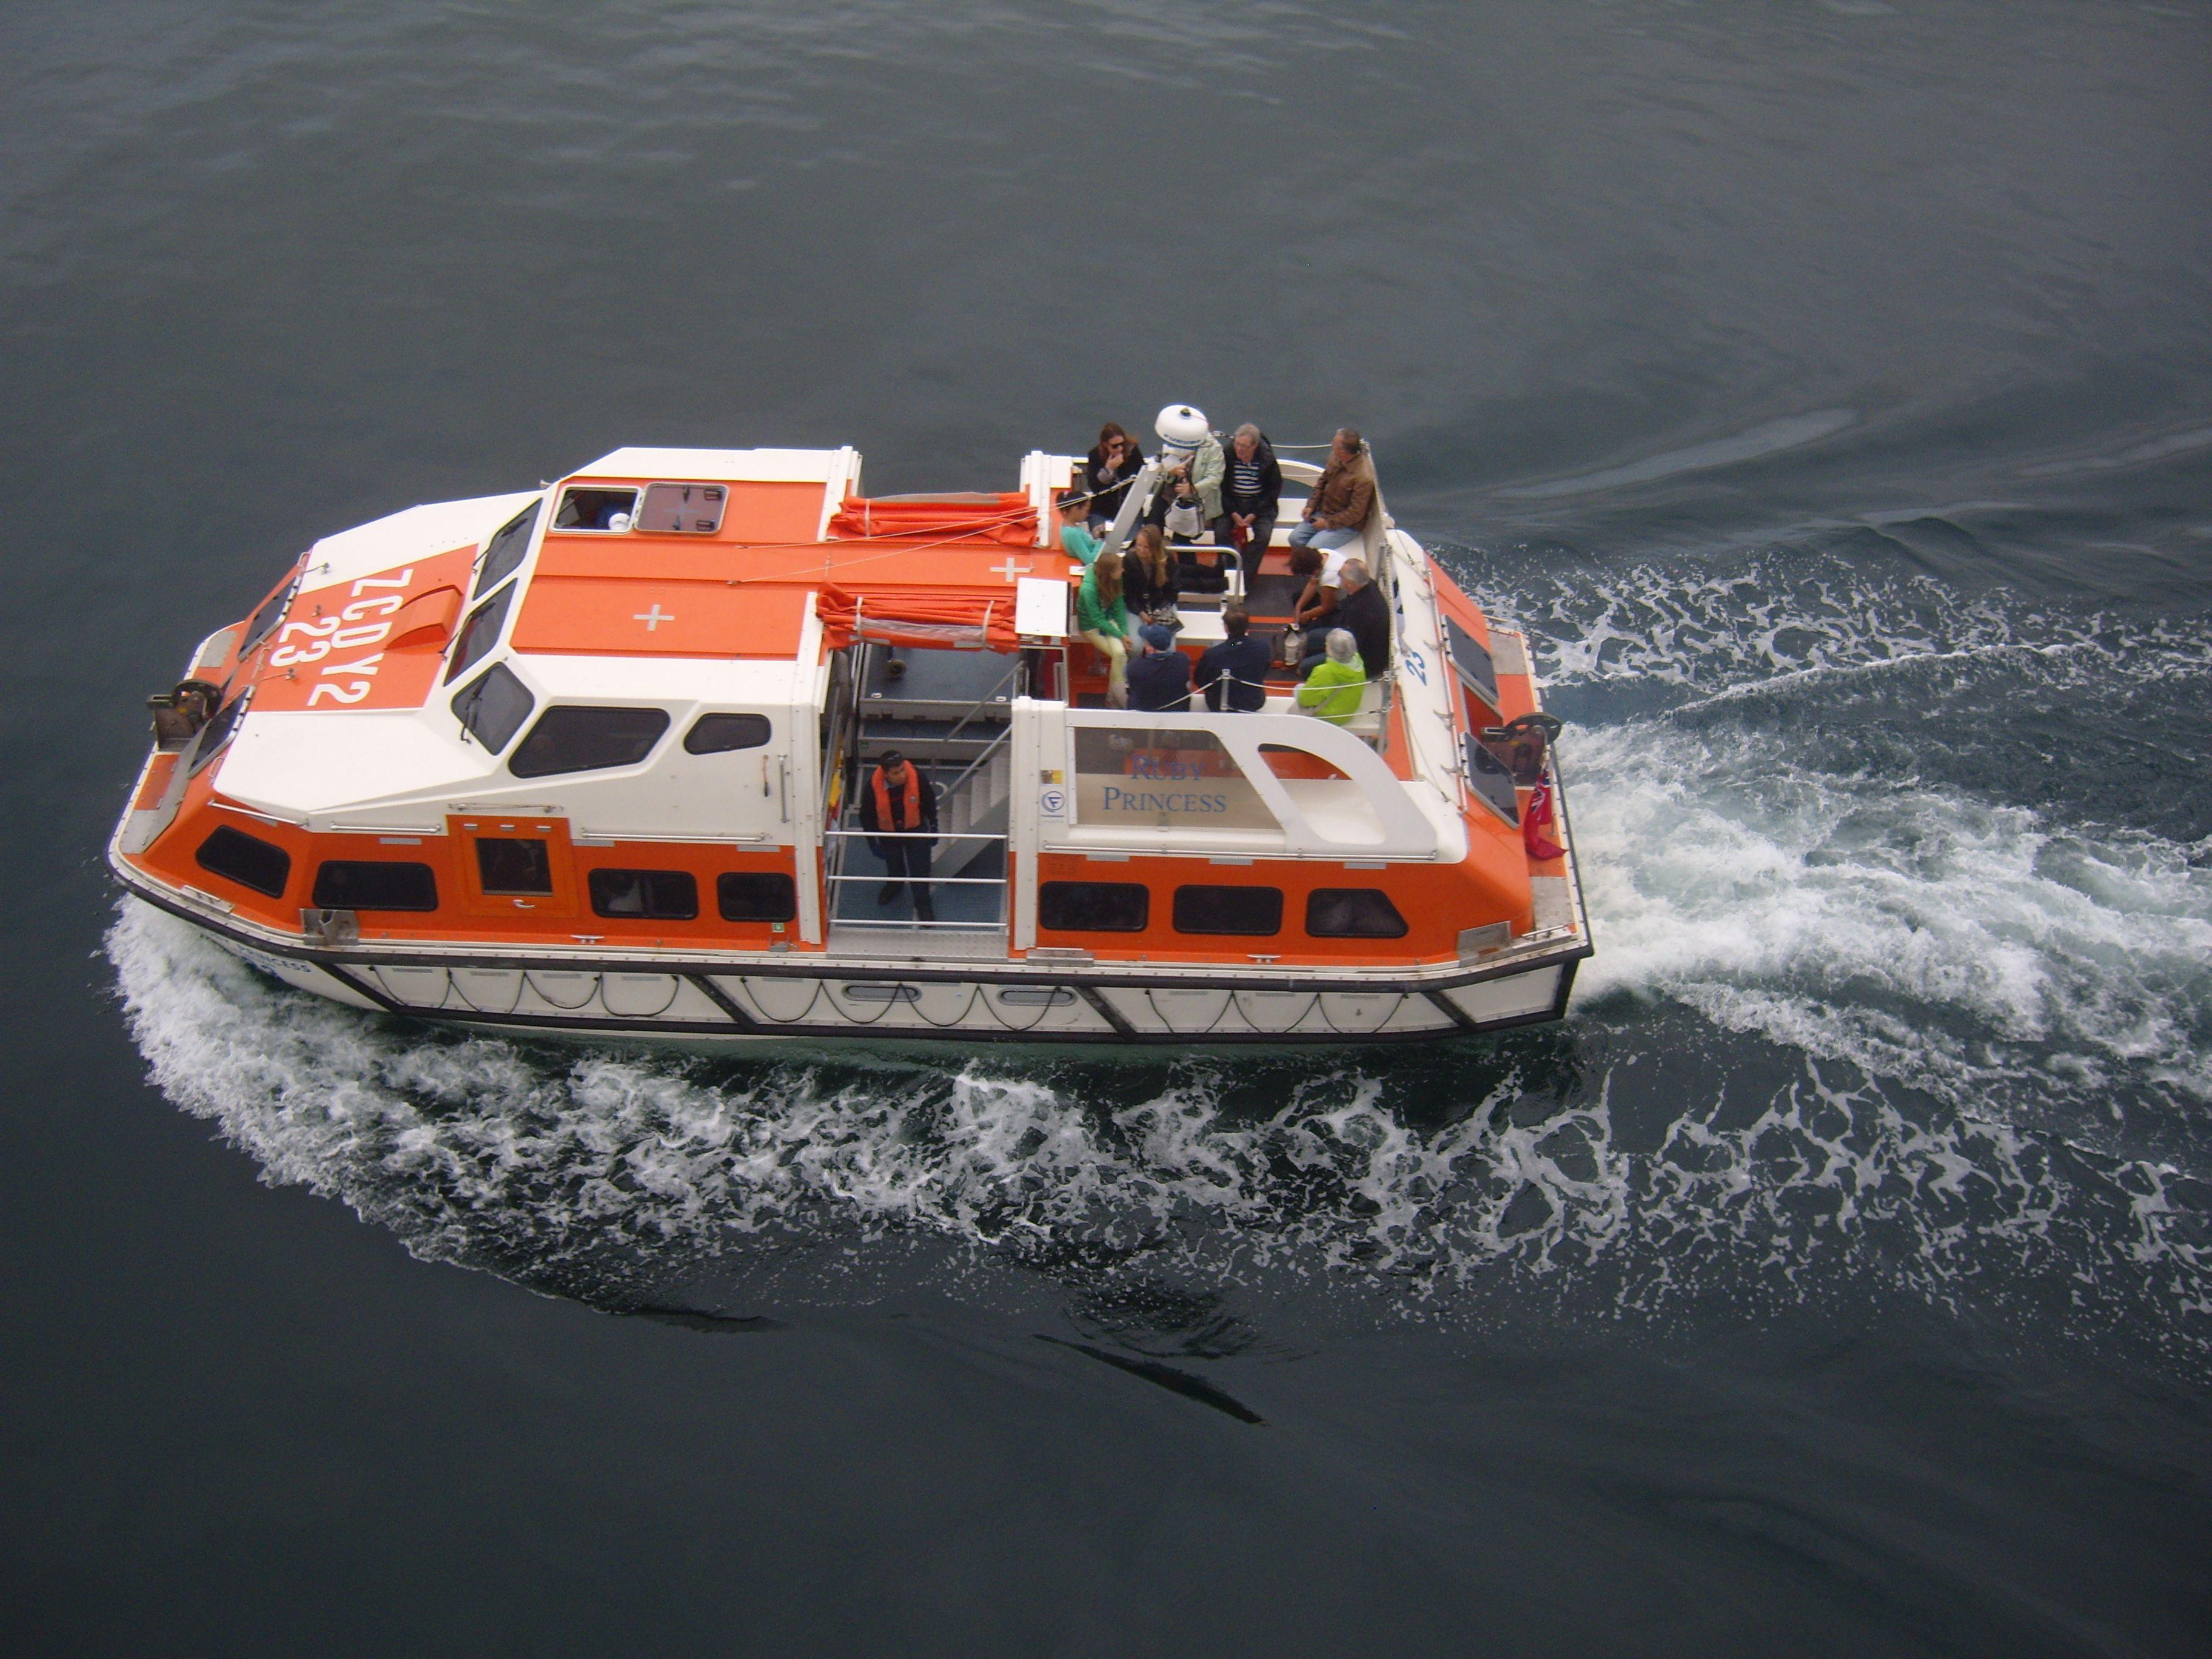 Ruby Princess Tender Taking People Ashore Cruise Boat Yacht